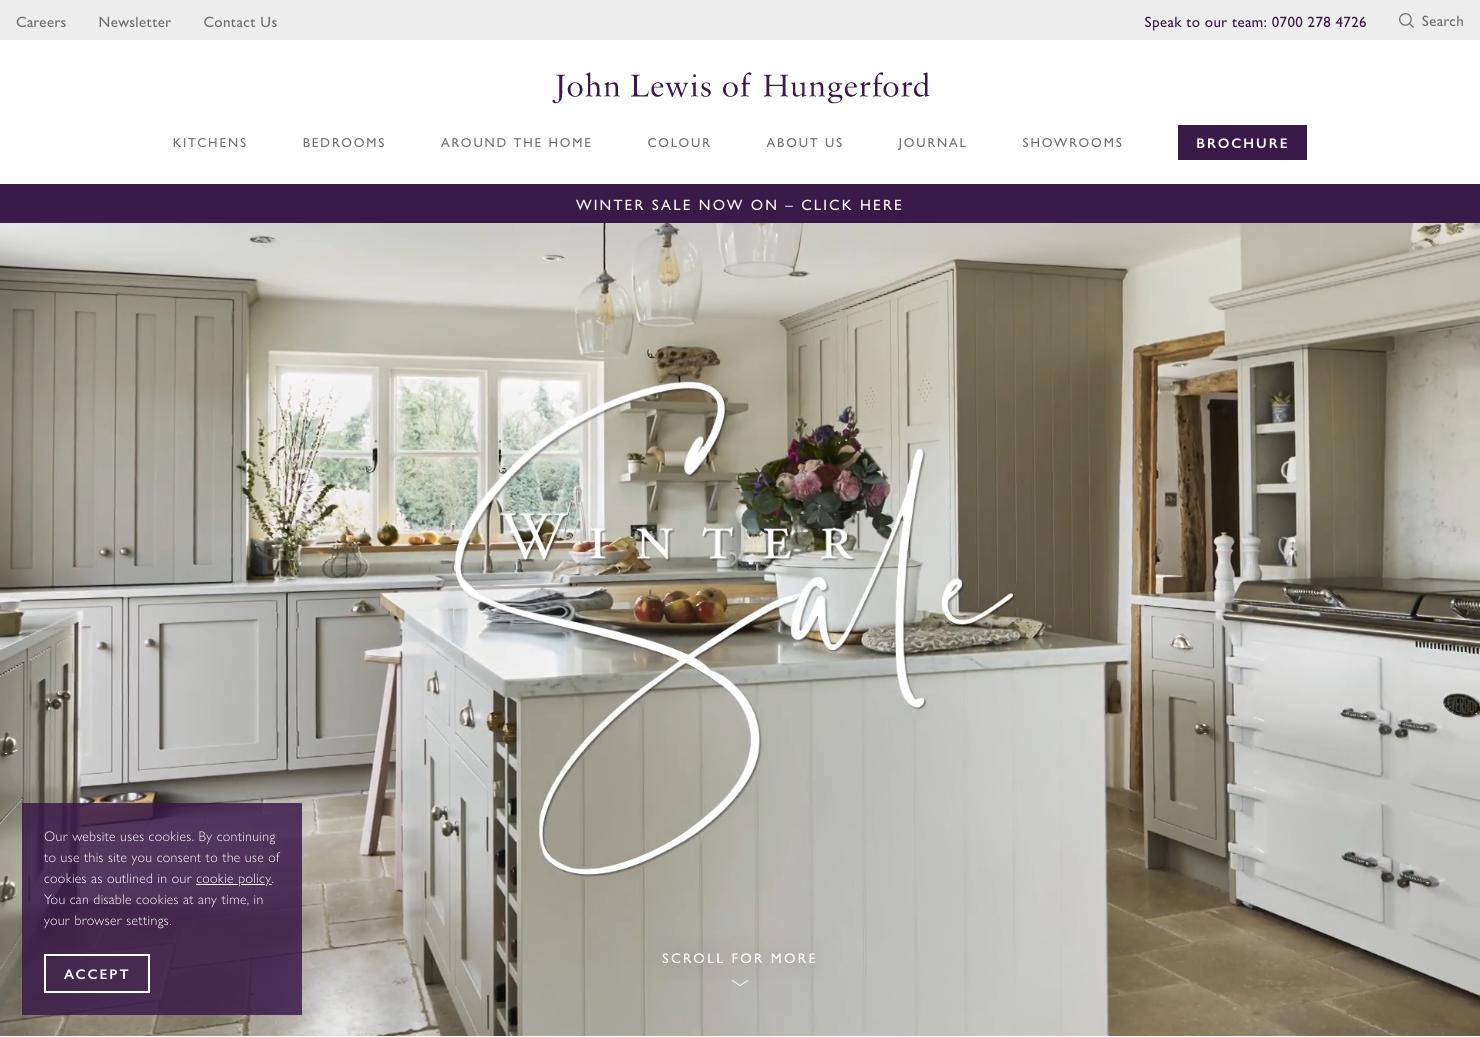 John Lewis Home Page